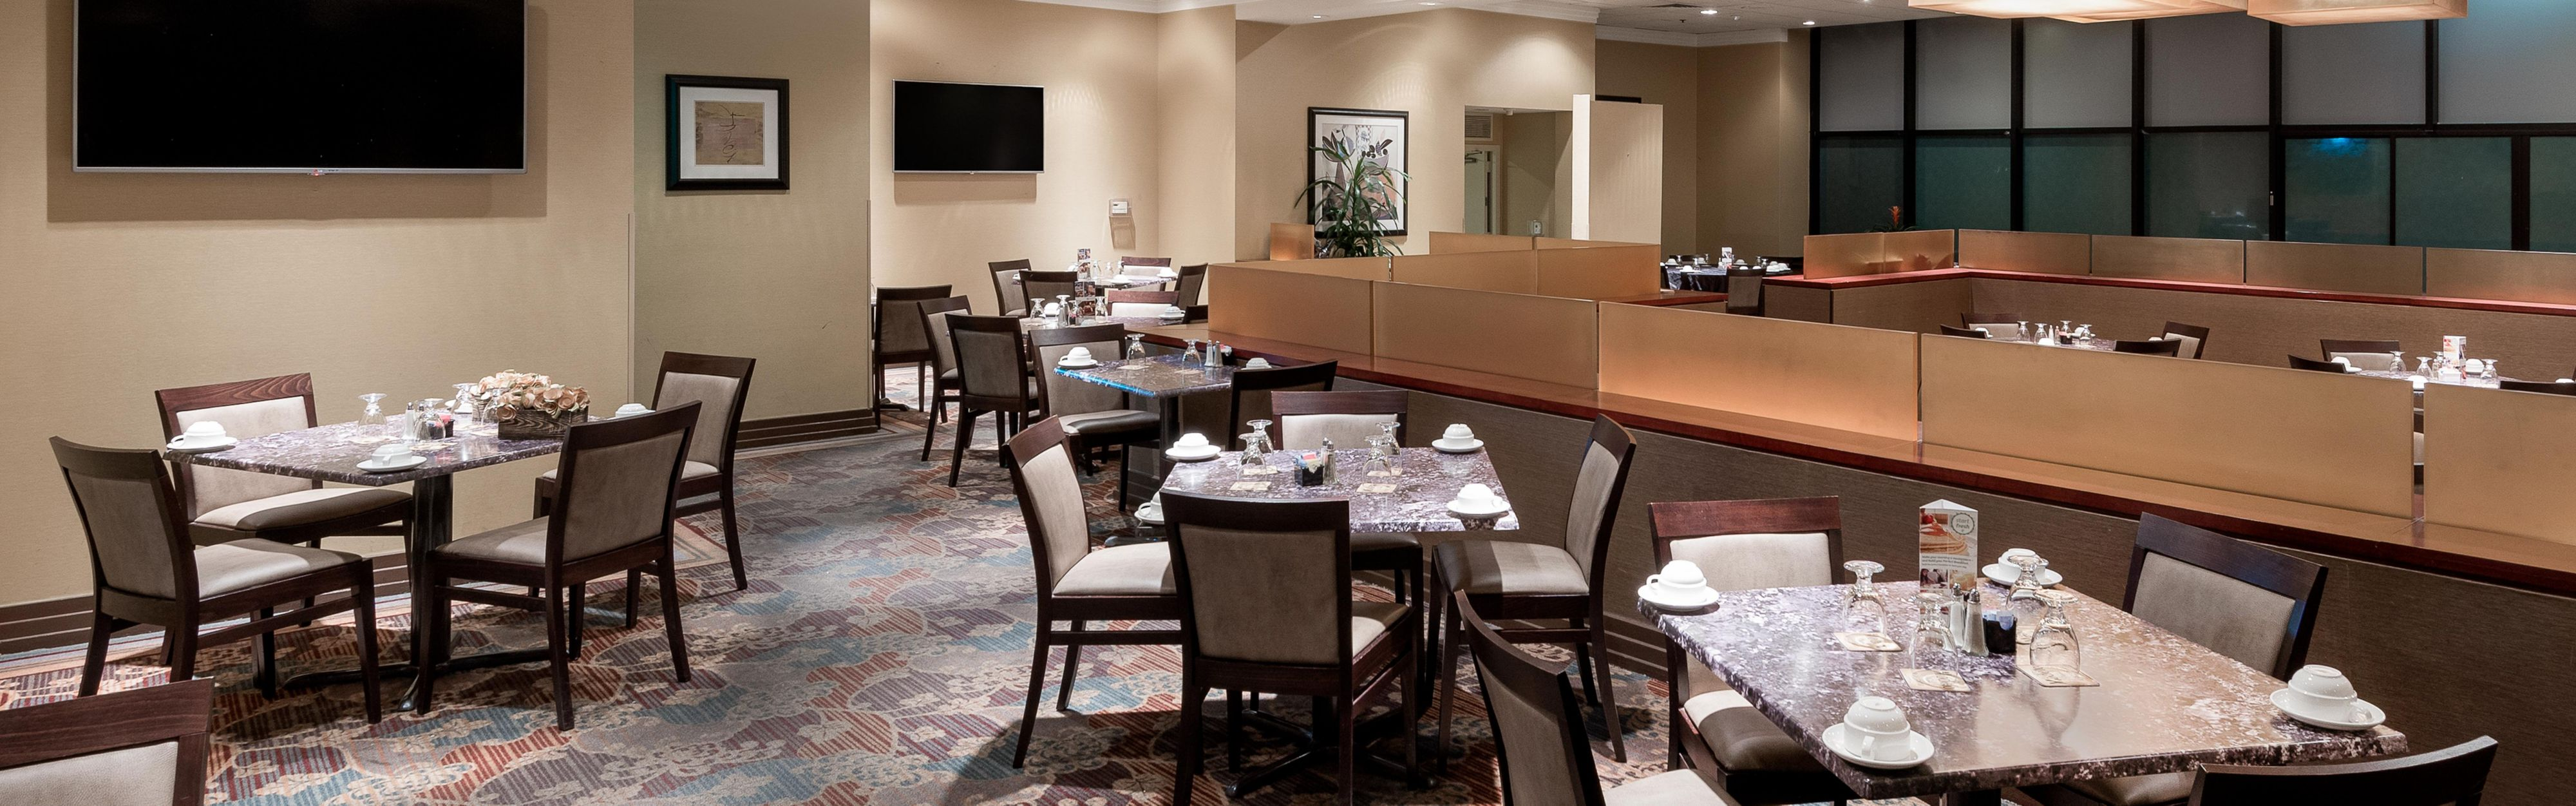 Holiday Inn Los Angeles Gateway - Torrance image 3